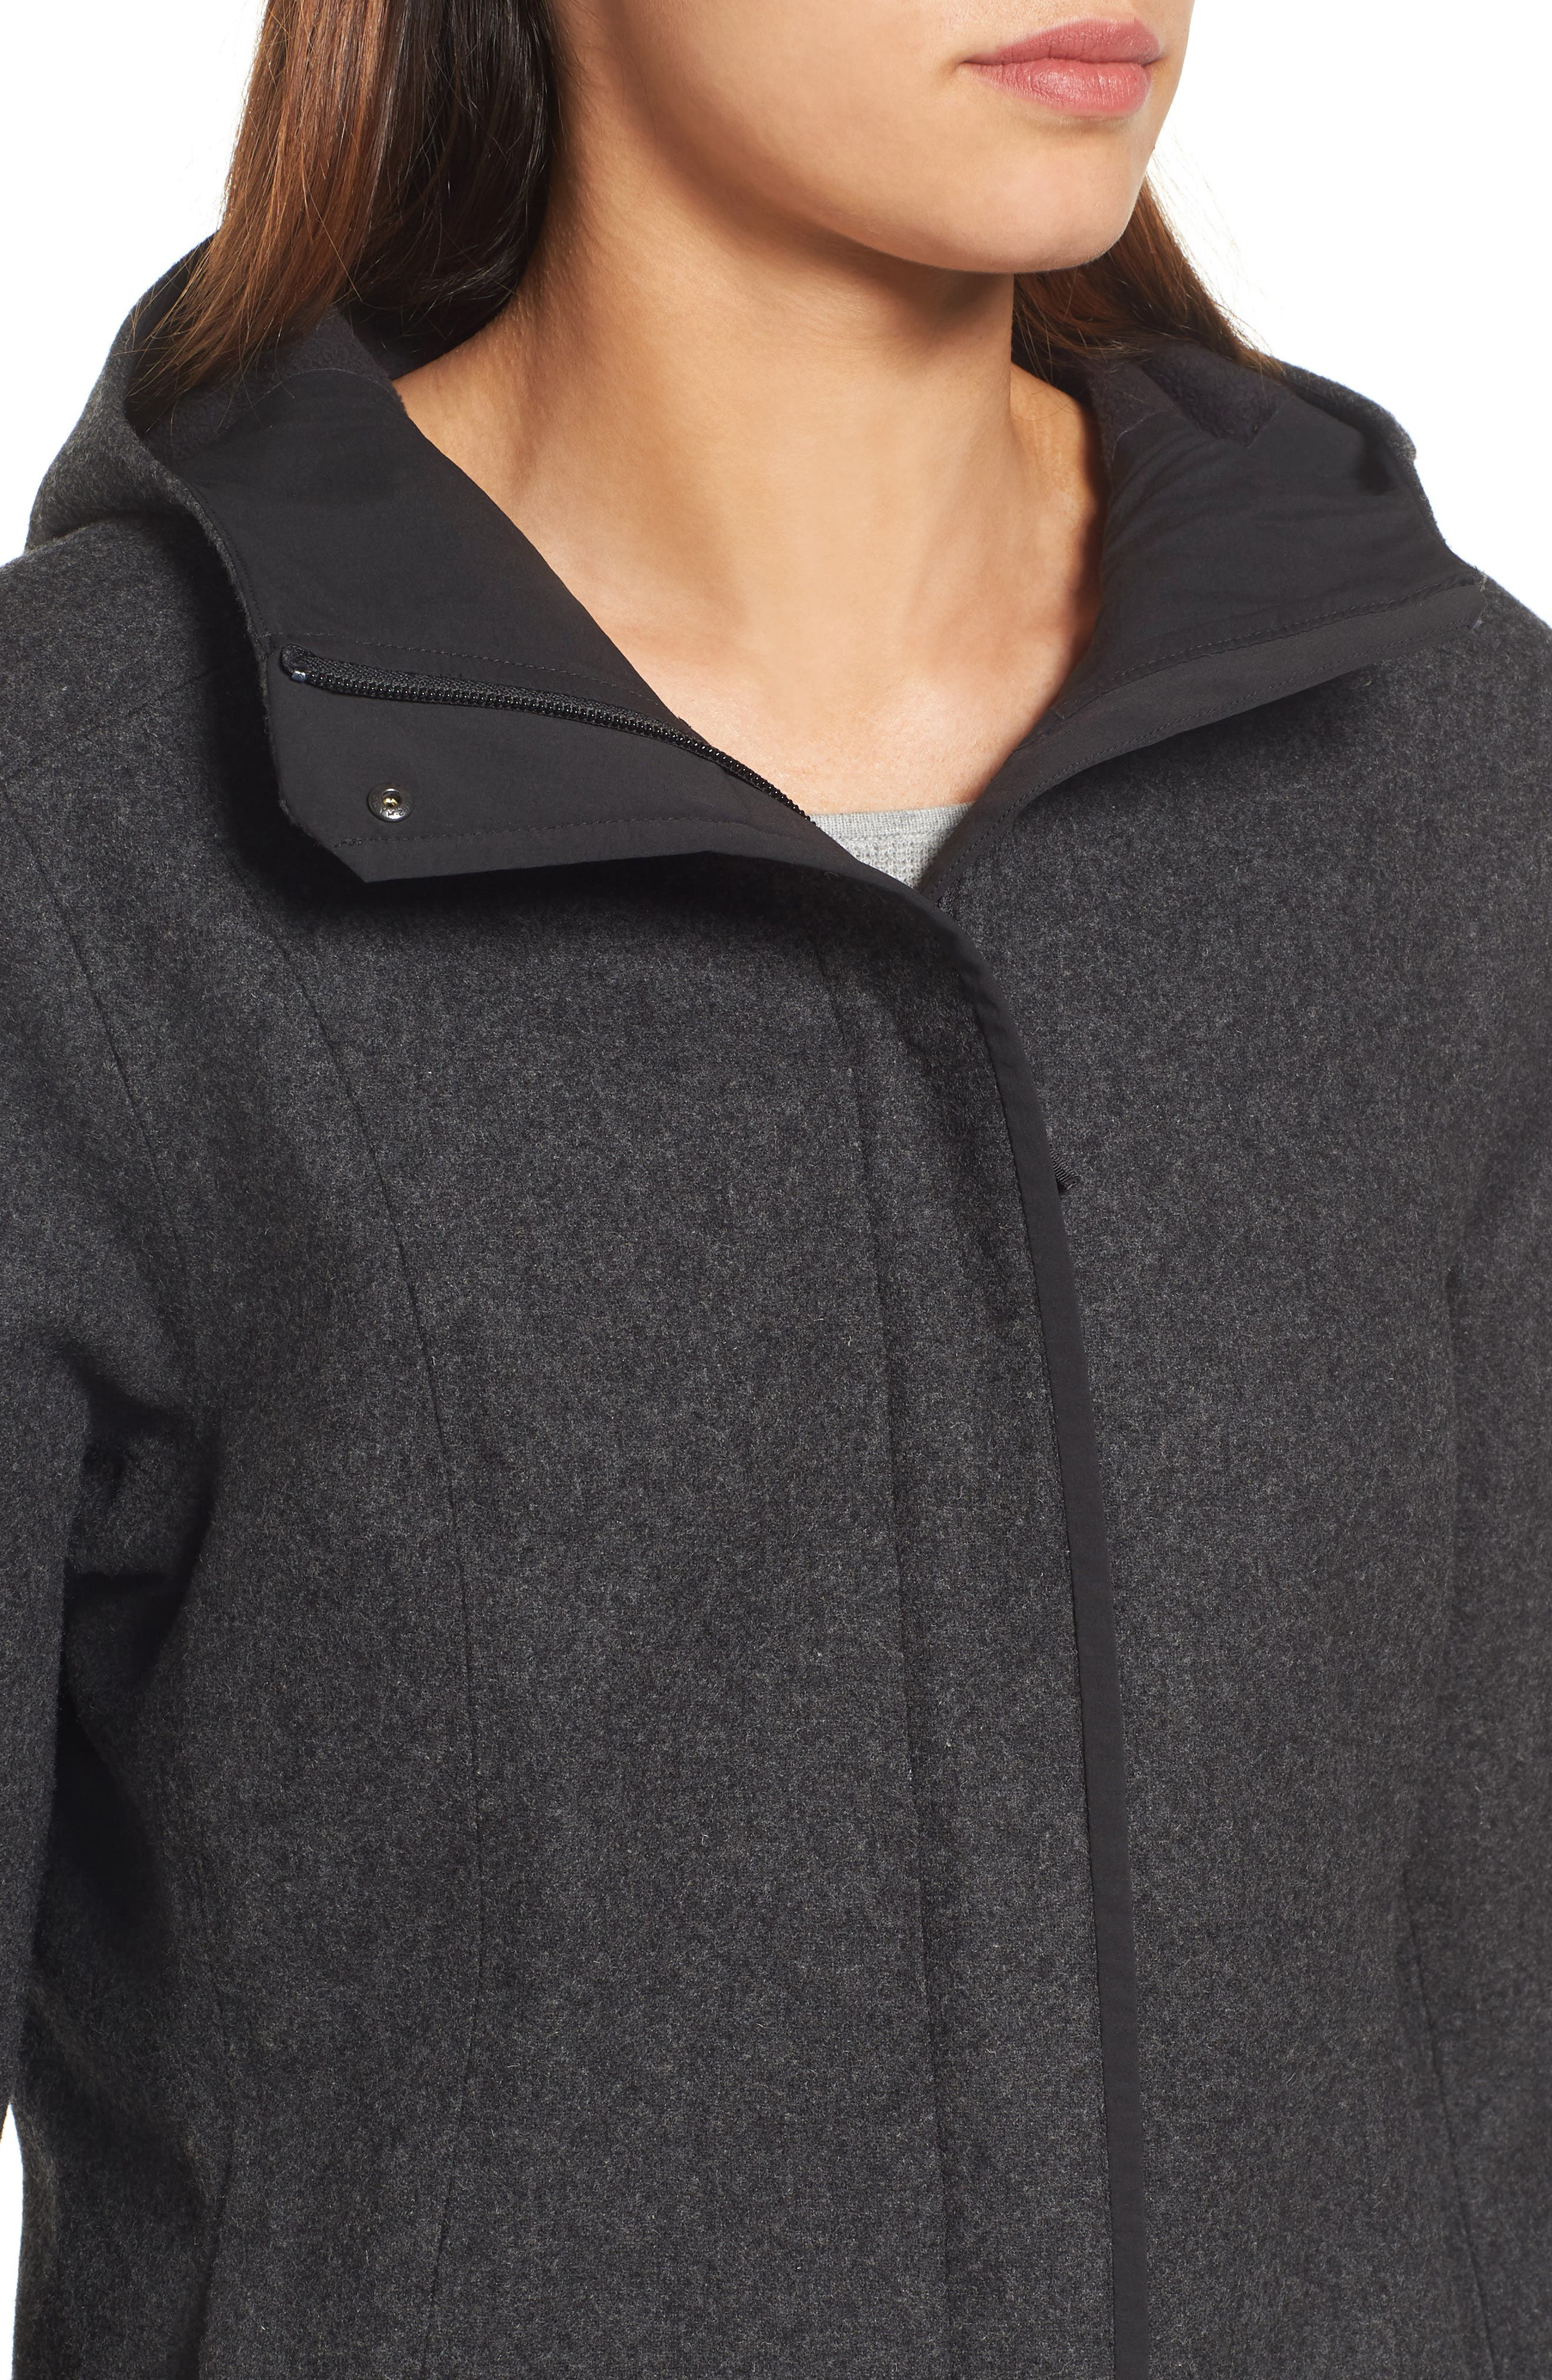 Embra Hooded Walking Coat,                             Alternate thumbnail 4, color,                             001